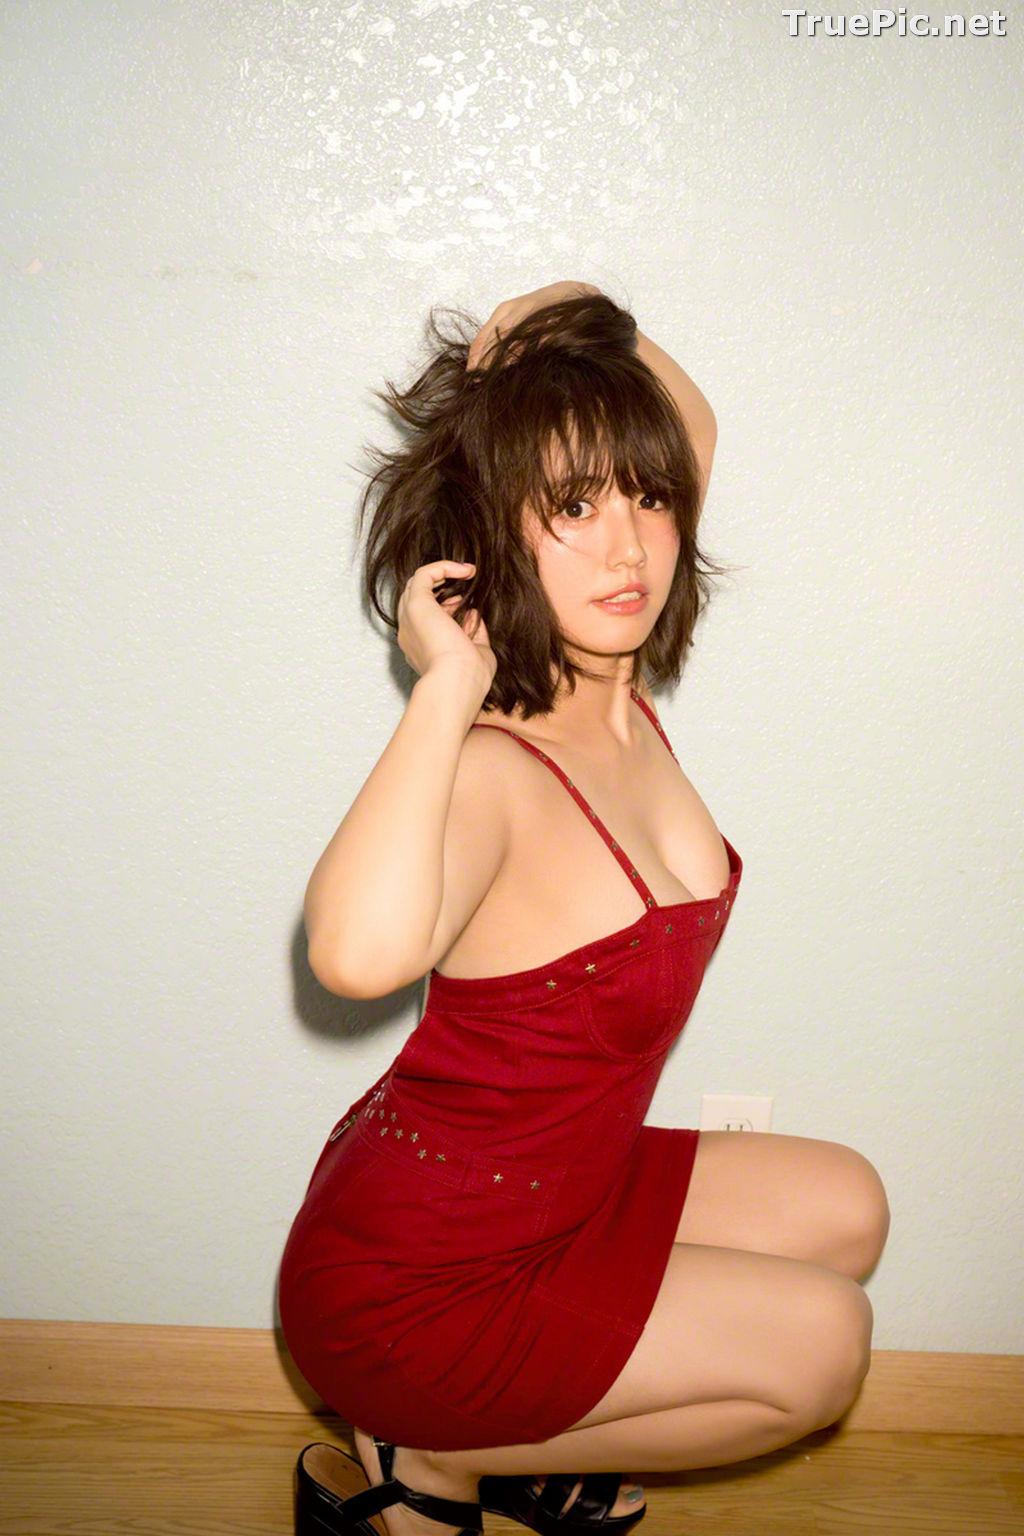 Image Wanibooks No.141 – Japanese Actress and Gravure Idol – Sayaka Isoyama - TruePic.net - Picture-6